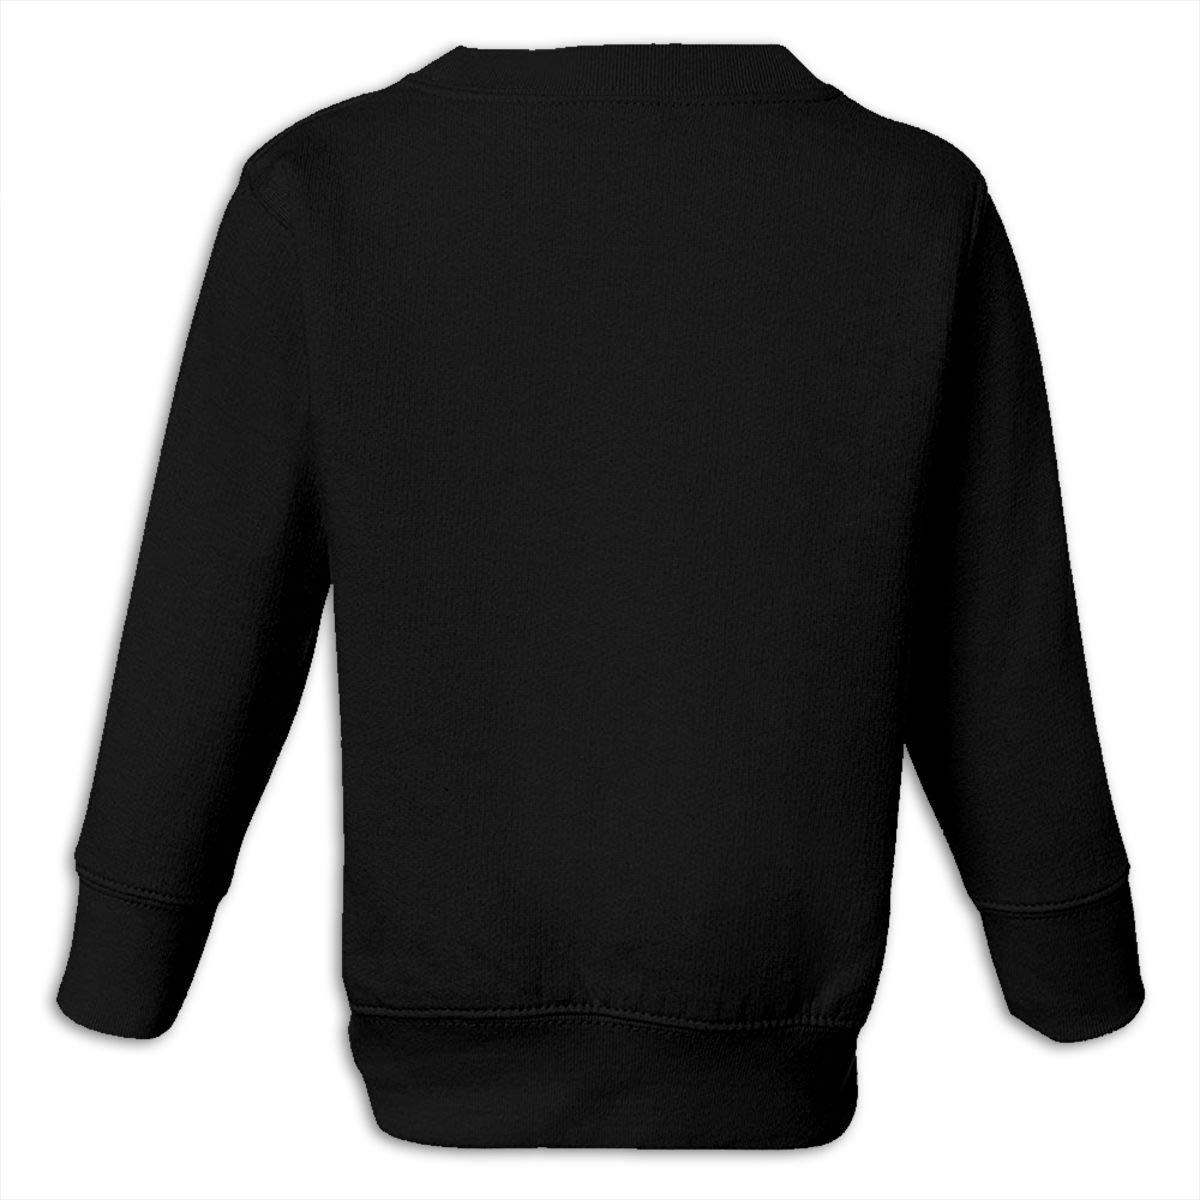 NMDJC CCQ So Cute Must Be Irish Baby Sweatshirt Adorable Juvenile Hoodies Cotton Outfits